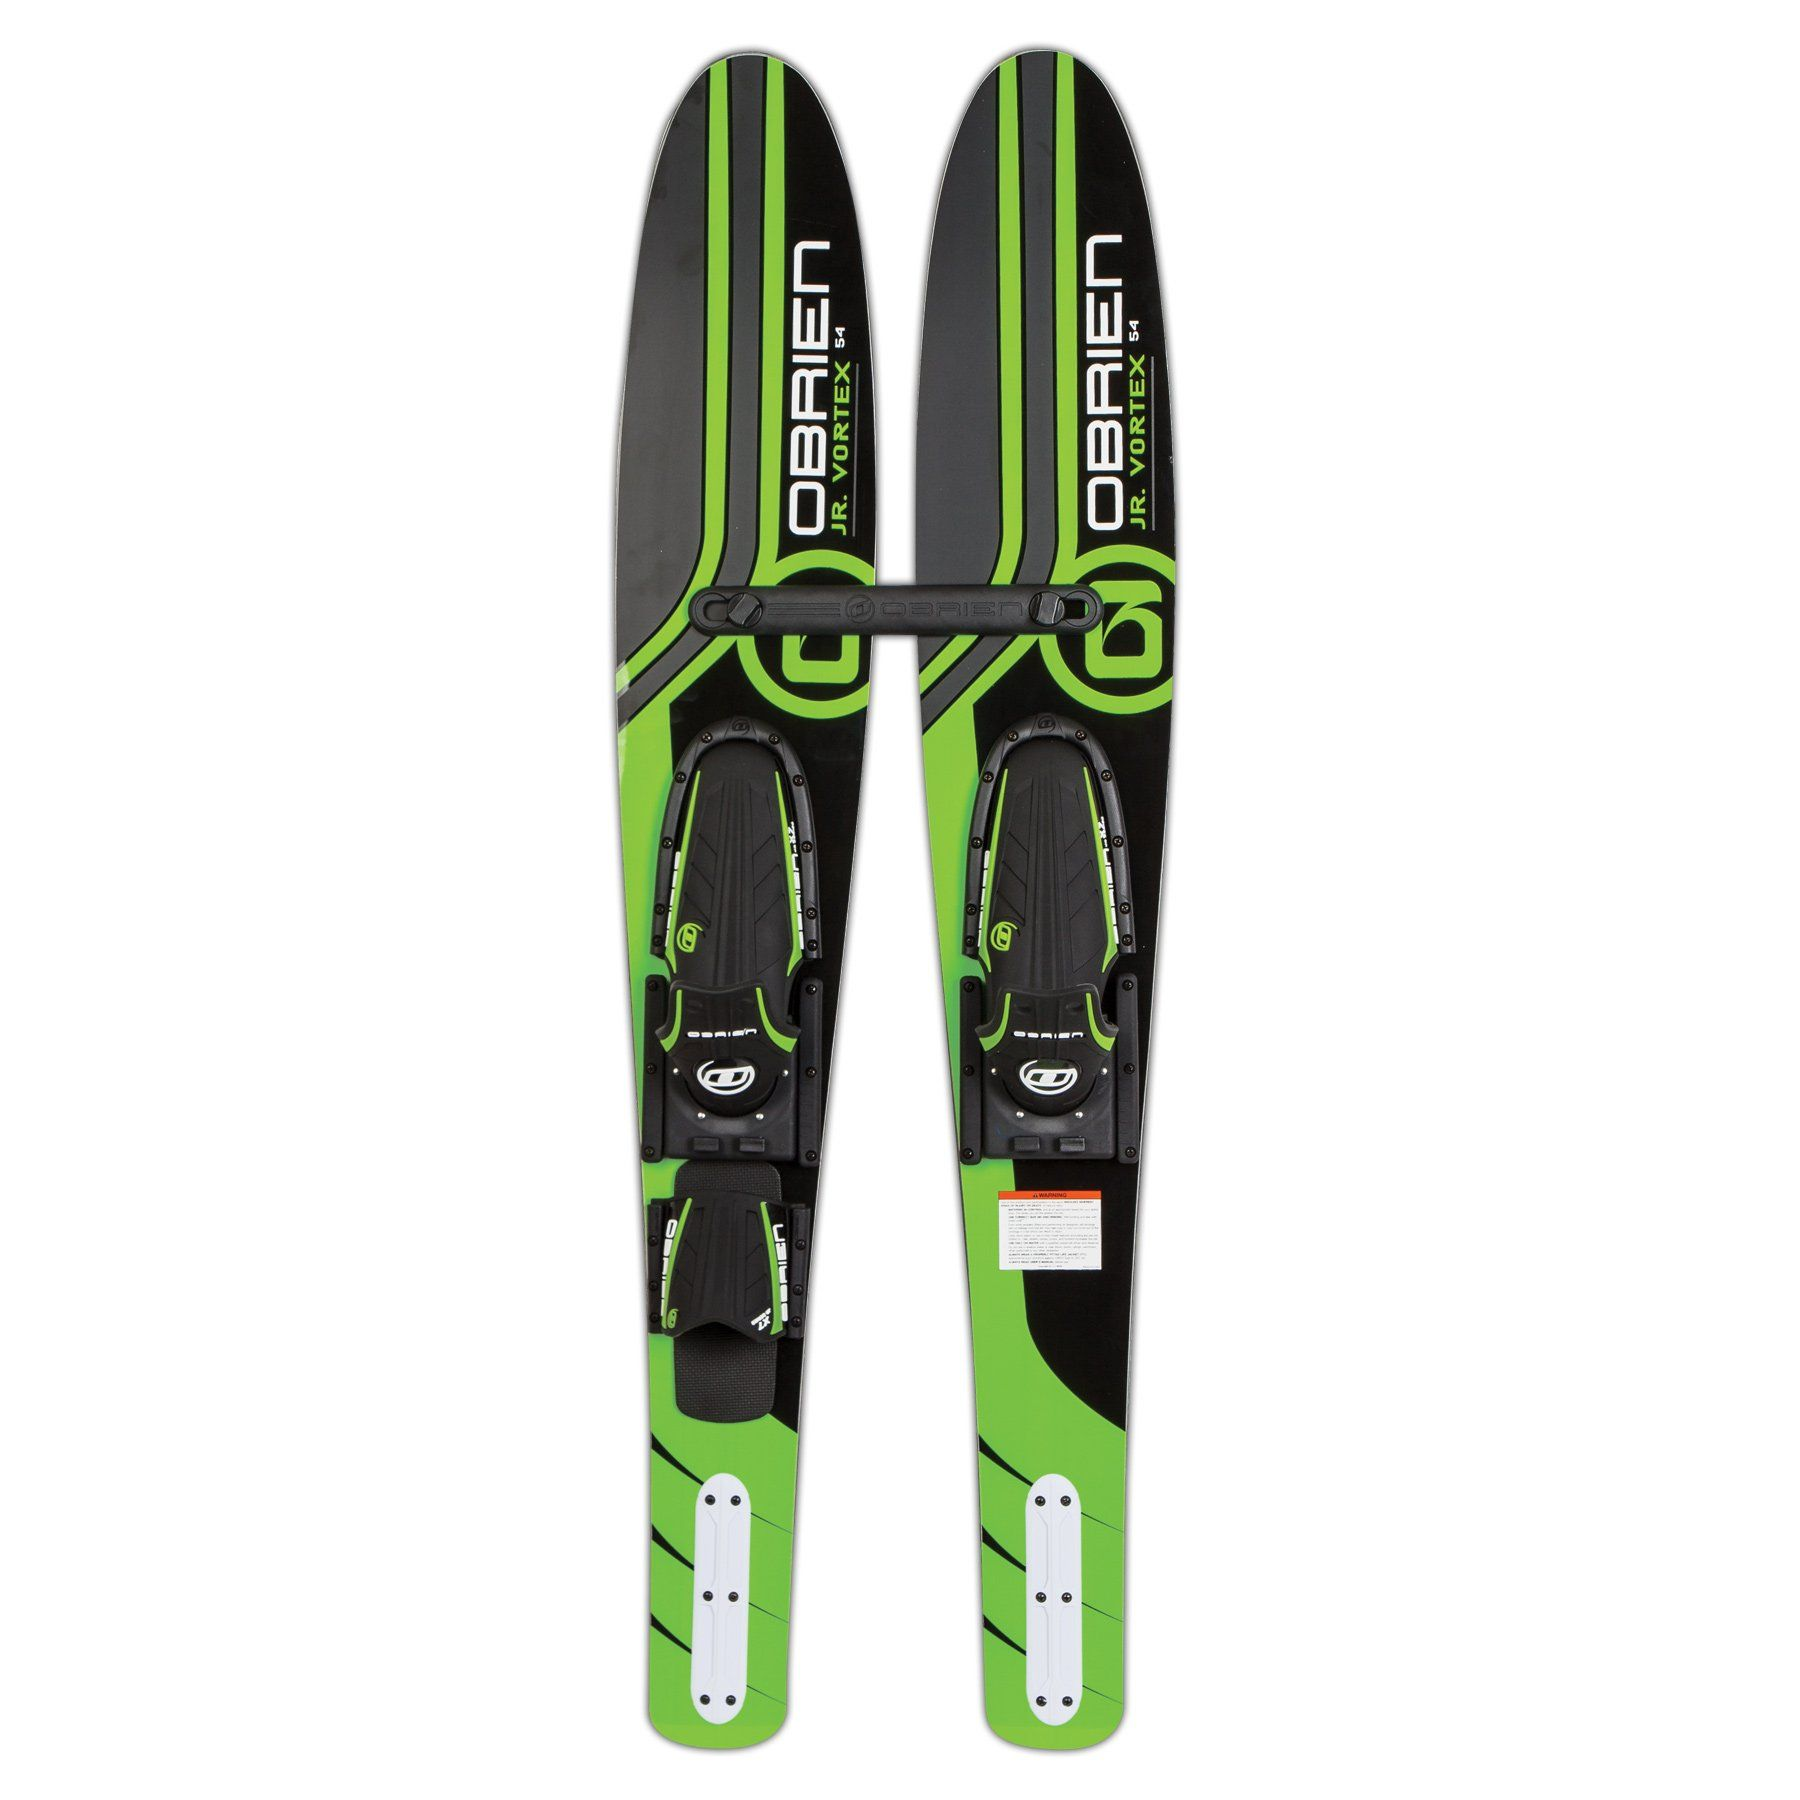 O Brien Vortex Jr Combo Water Skis Water Skis Water Skiing Skiing